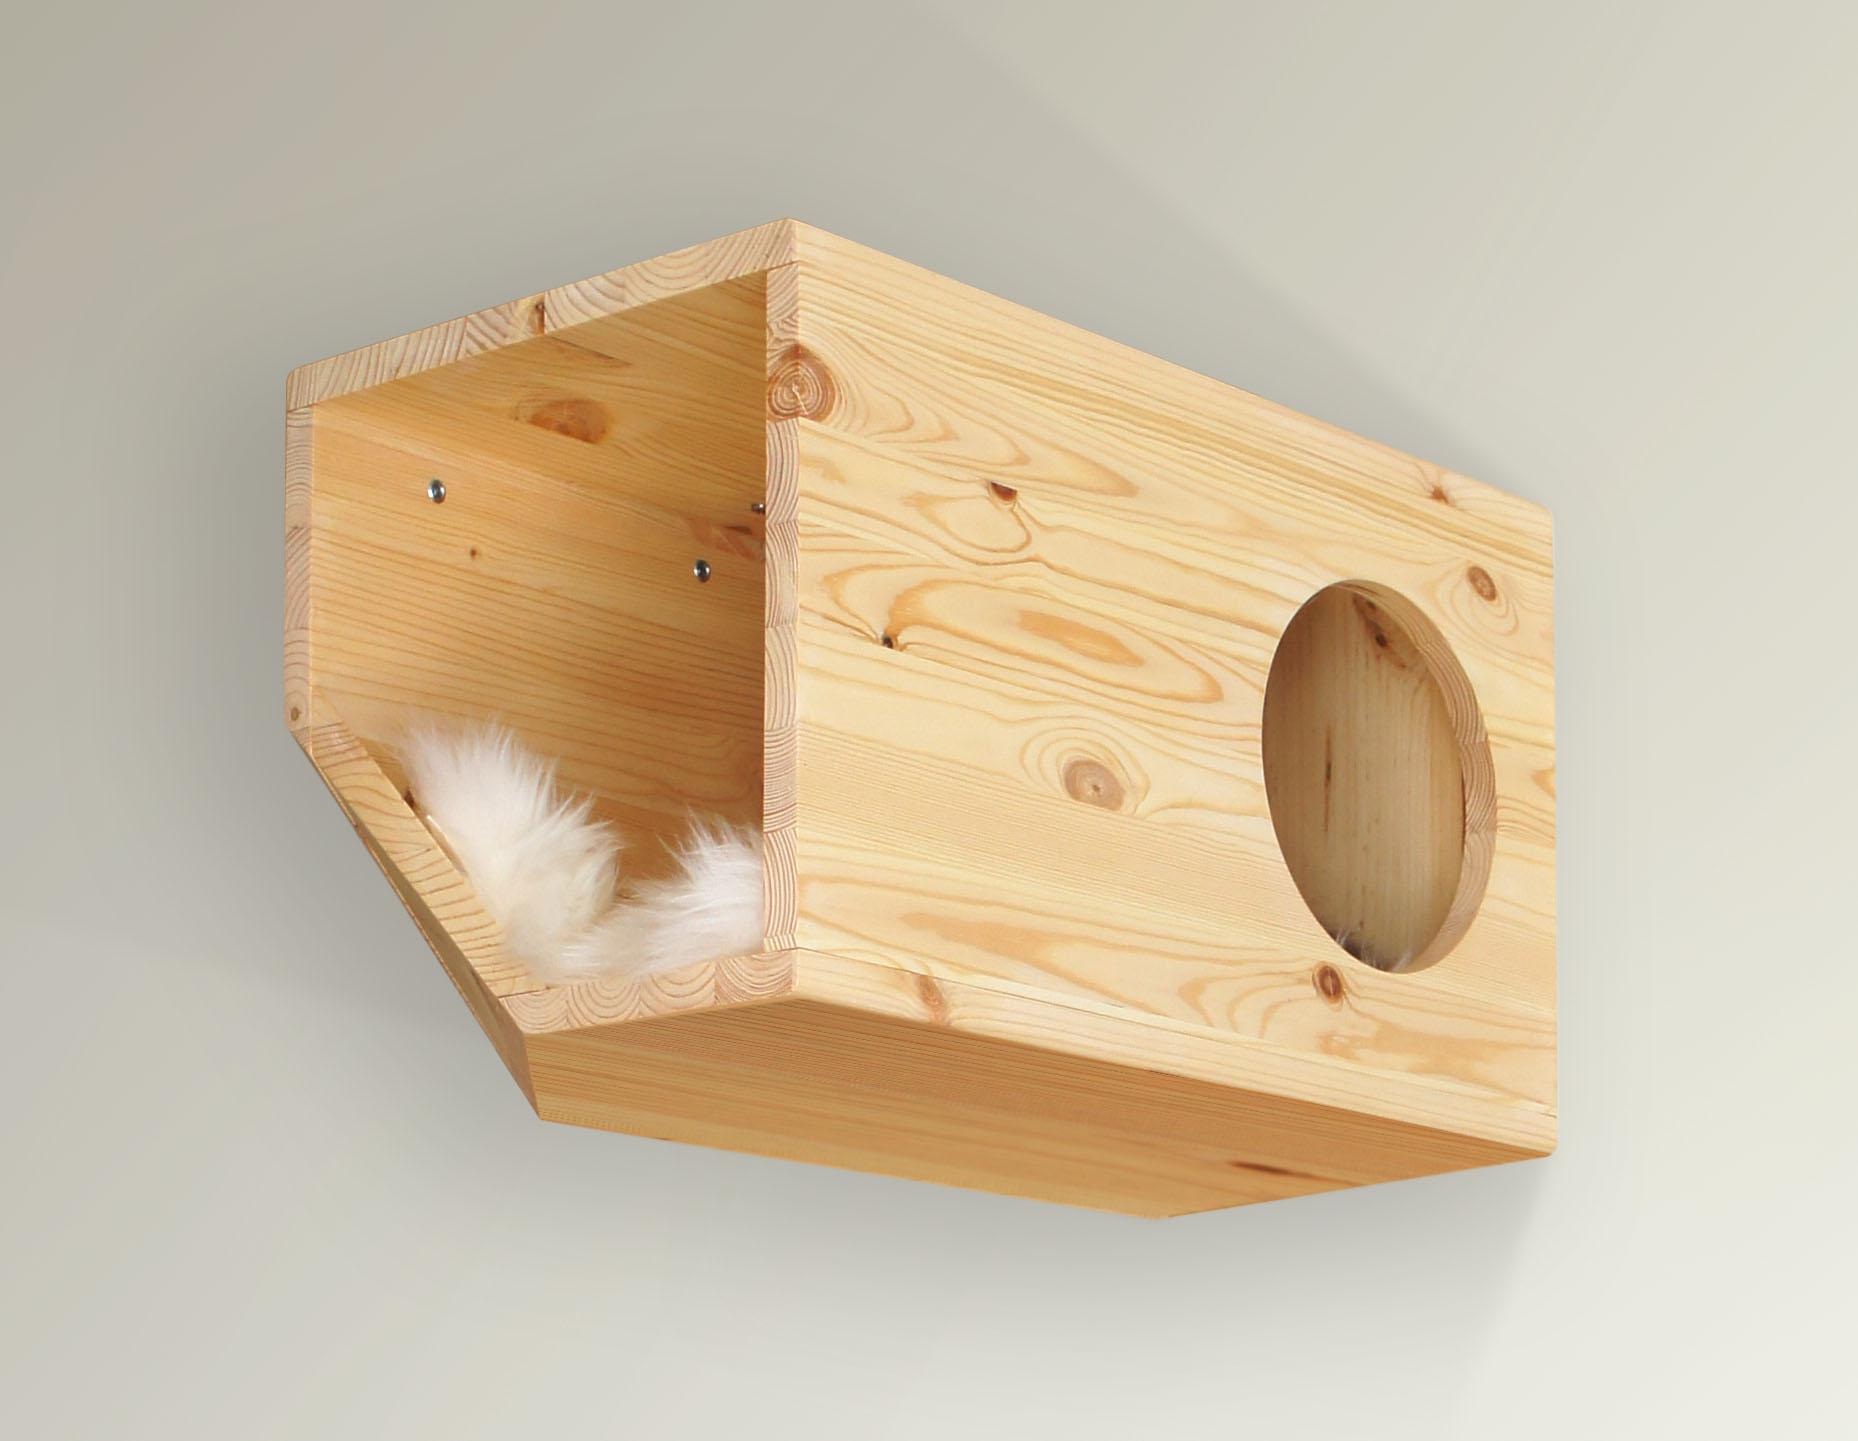 Cat House Catissa Cat House Module Catissa We Create Cool Stuff For Cats